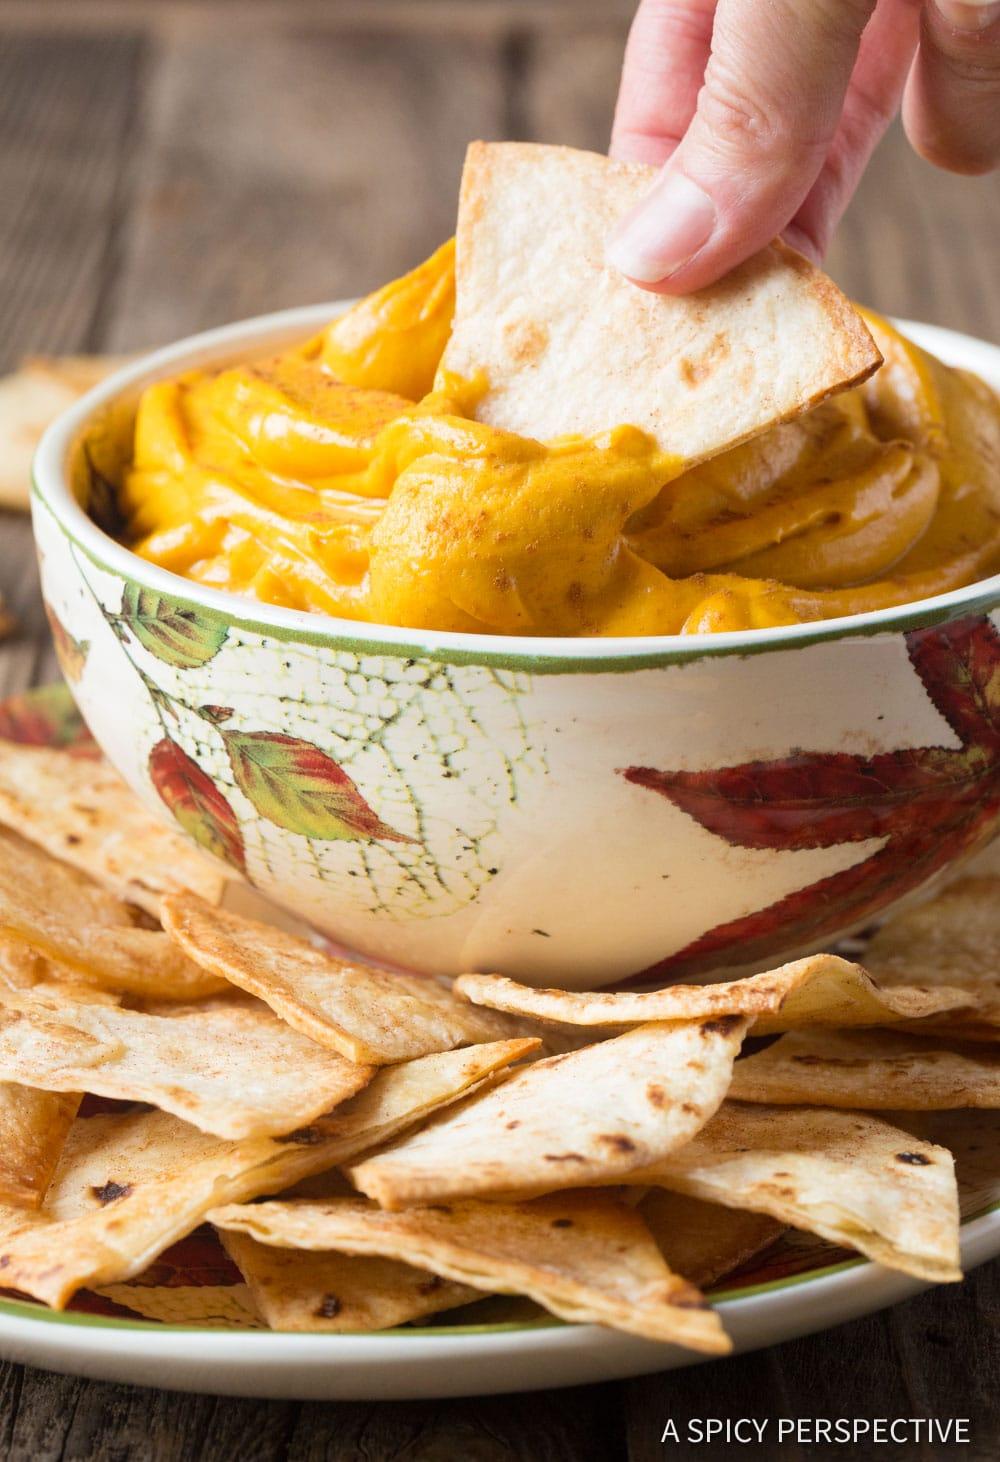 4-Ingredient Pumpkin Pie Dip + Cinnamon Chips Recipe #ASpicyPerspective #Halloween #Thanksgiving